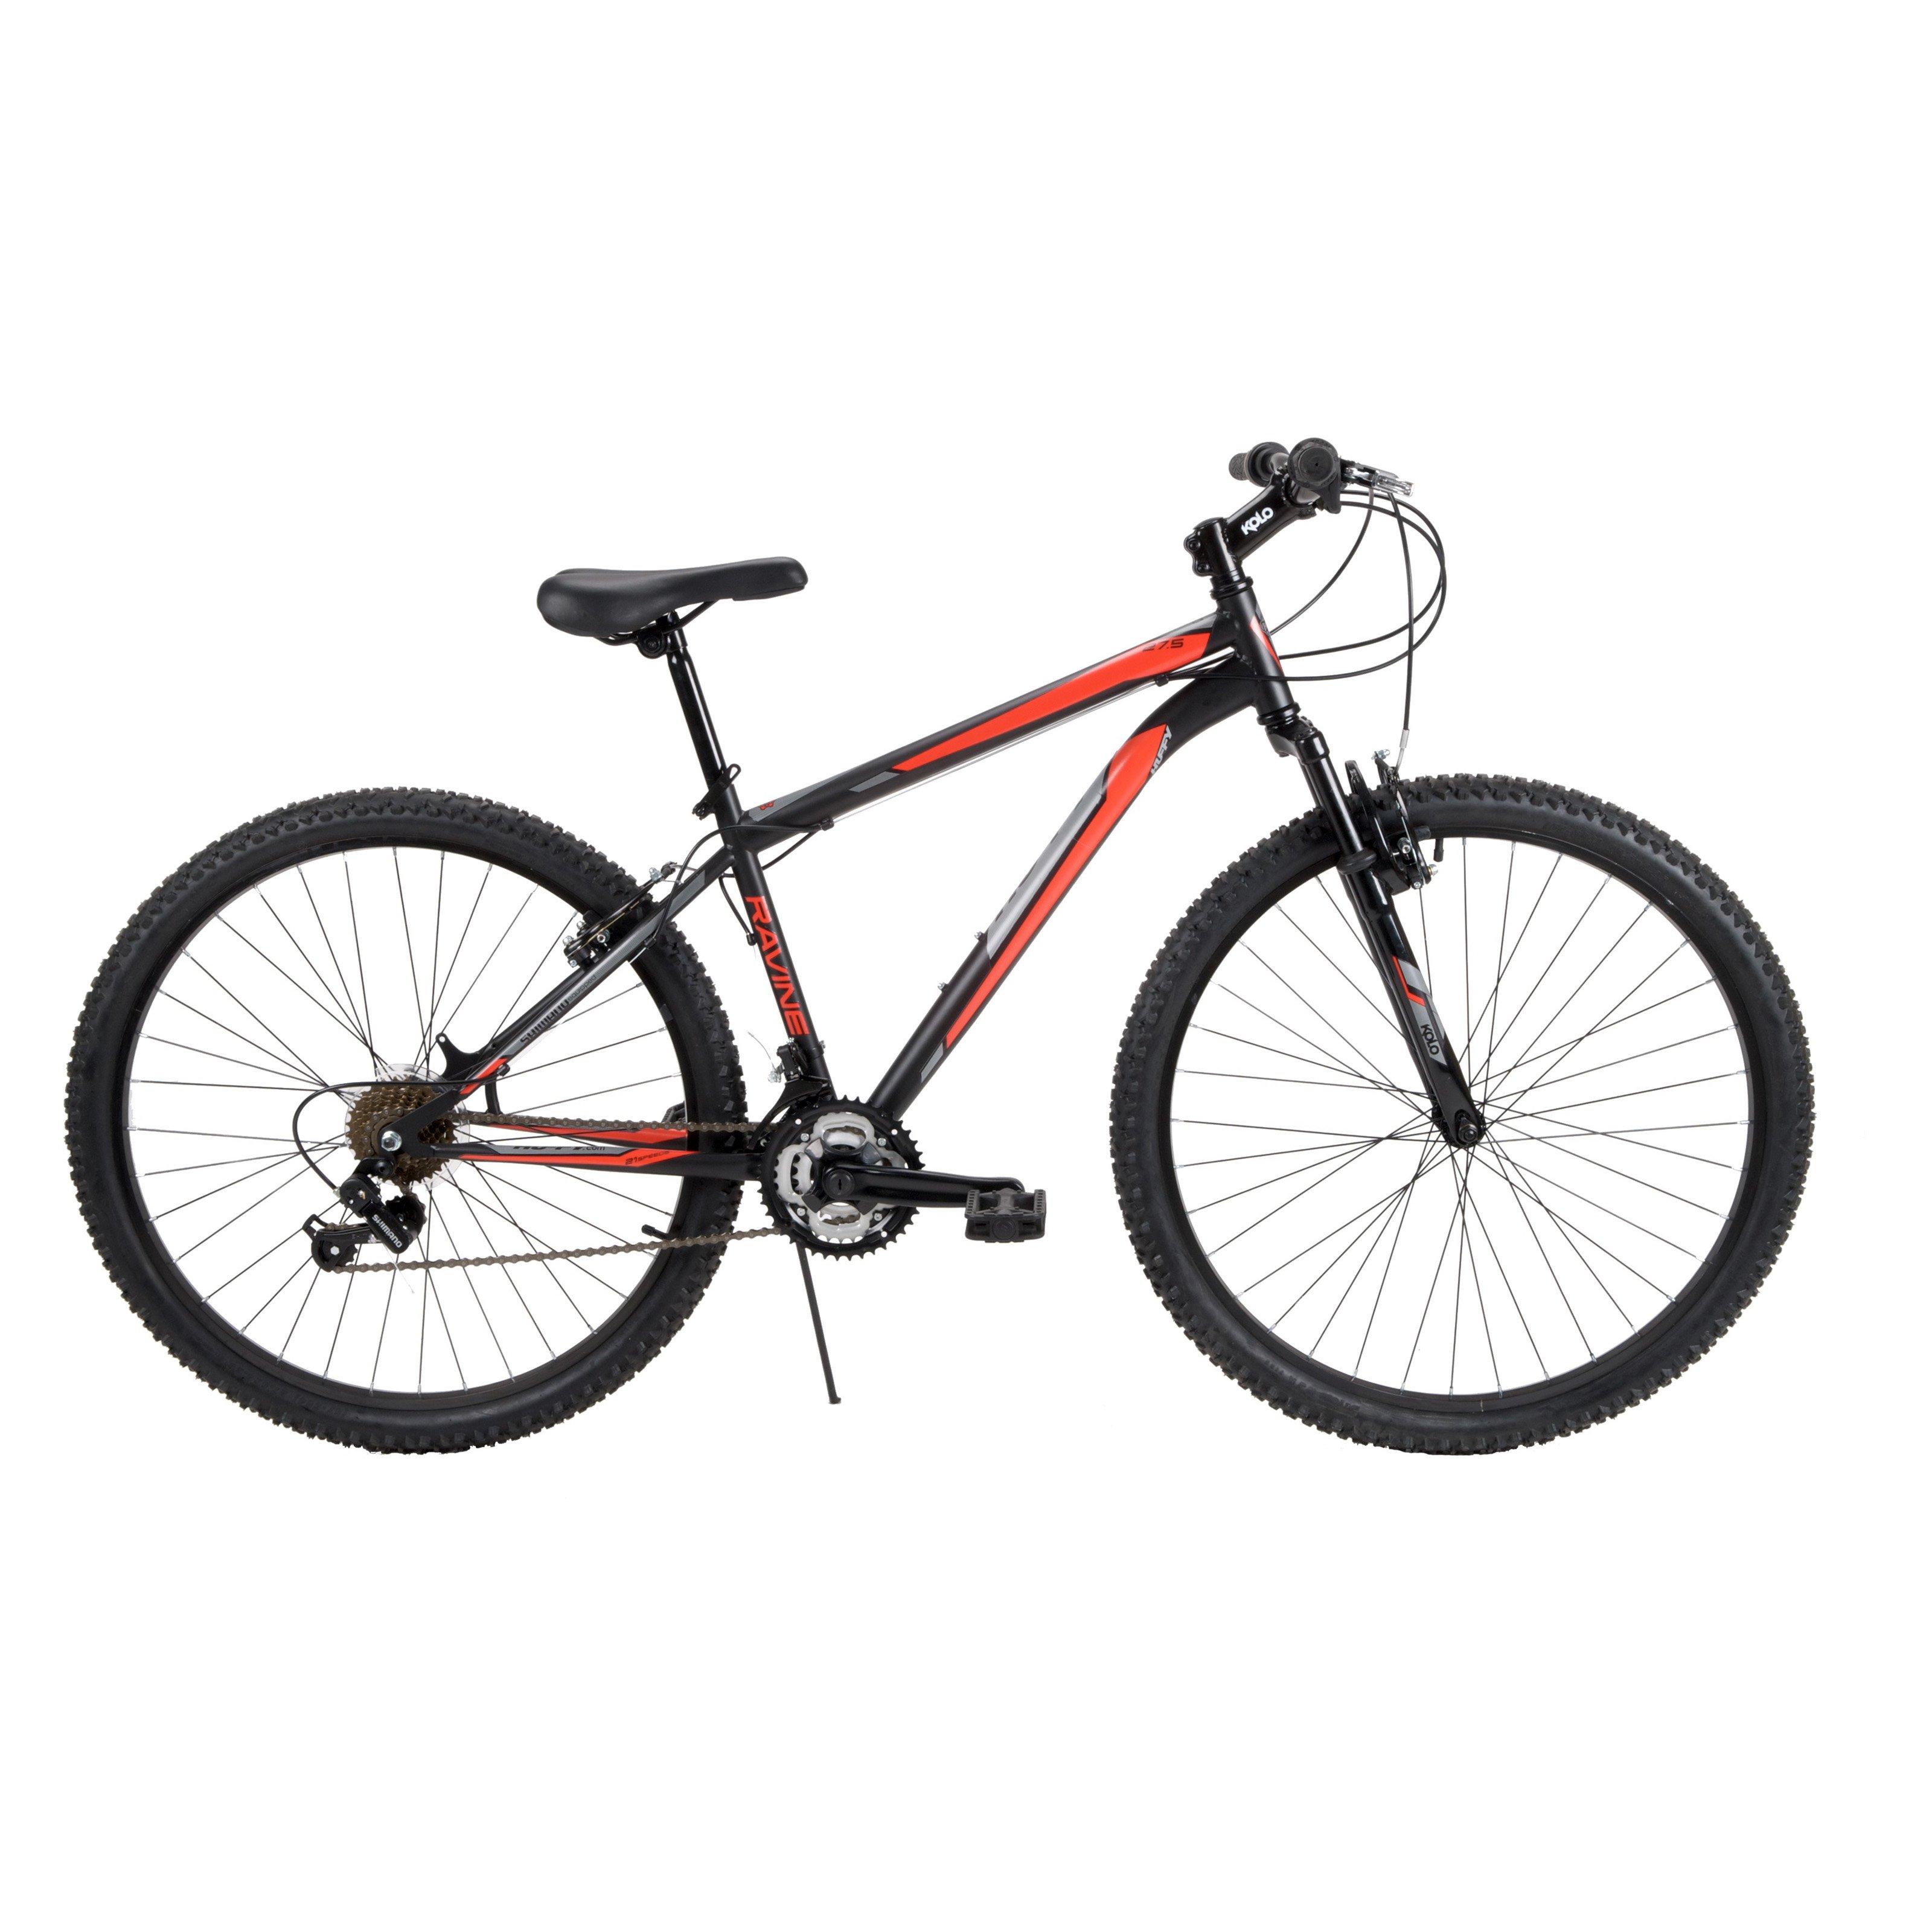 Huffy 27.5 in. Ravine Mens Mountain Bike